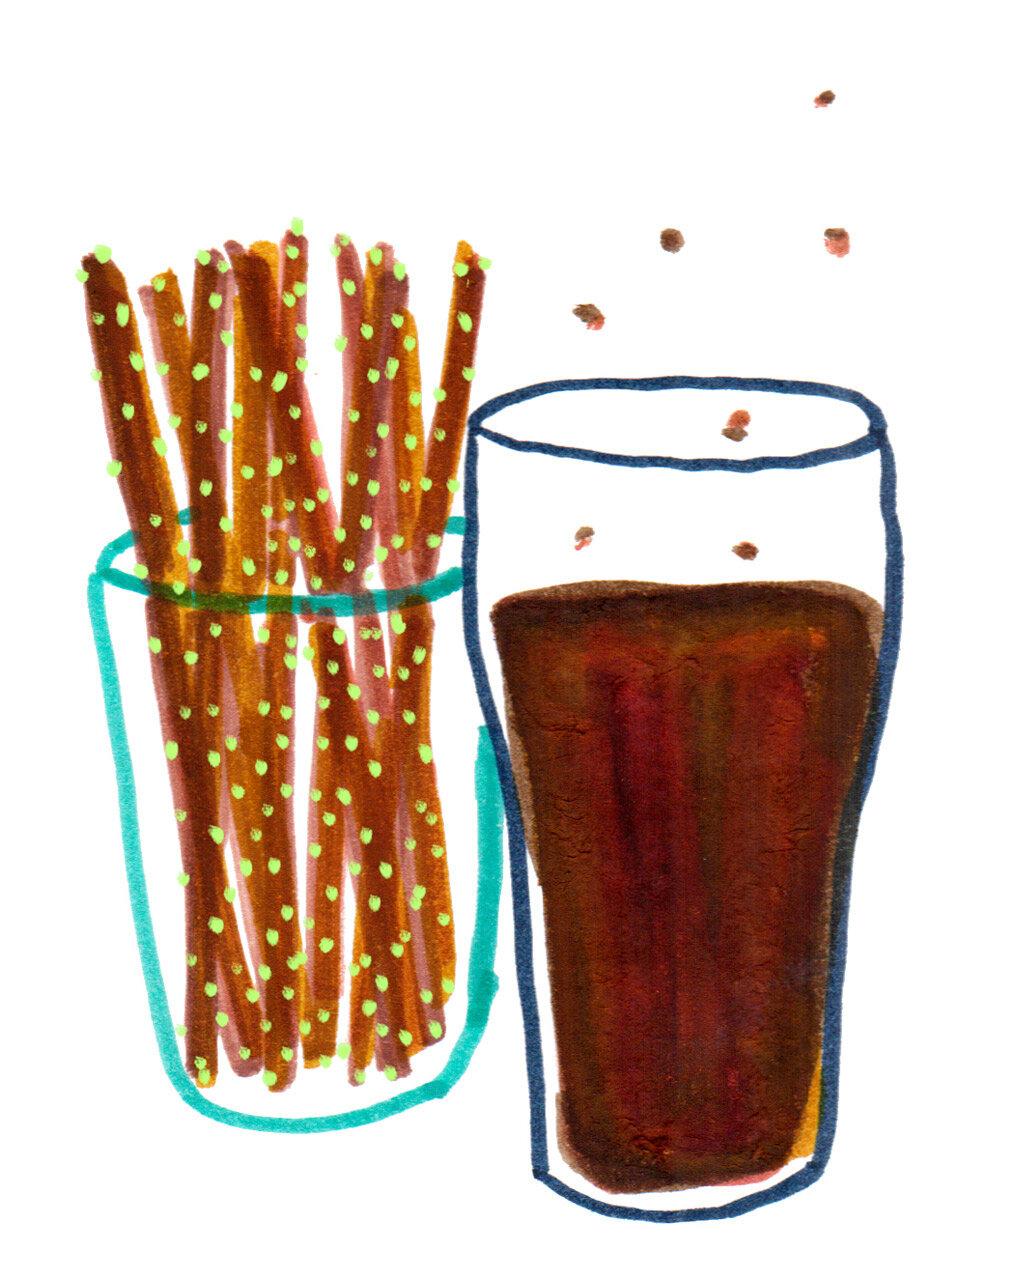 Illustration-Salzstangen-Cola_Deborah-Laetsch.jpg